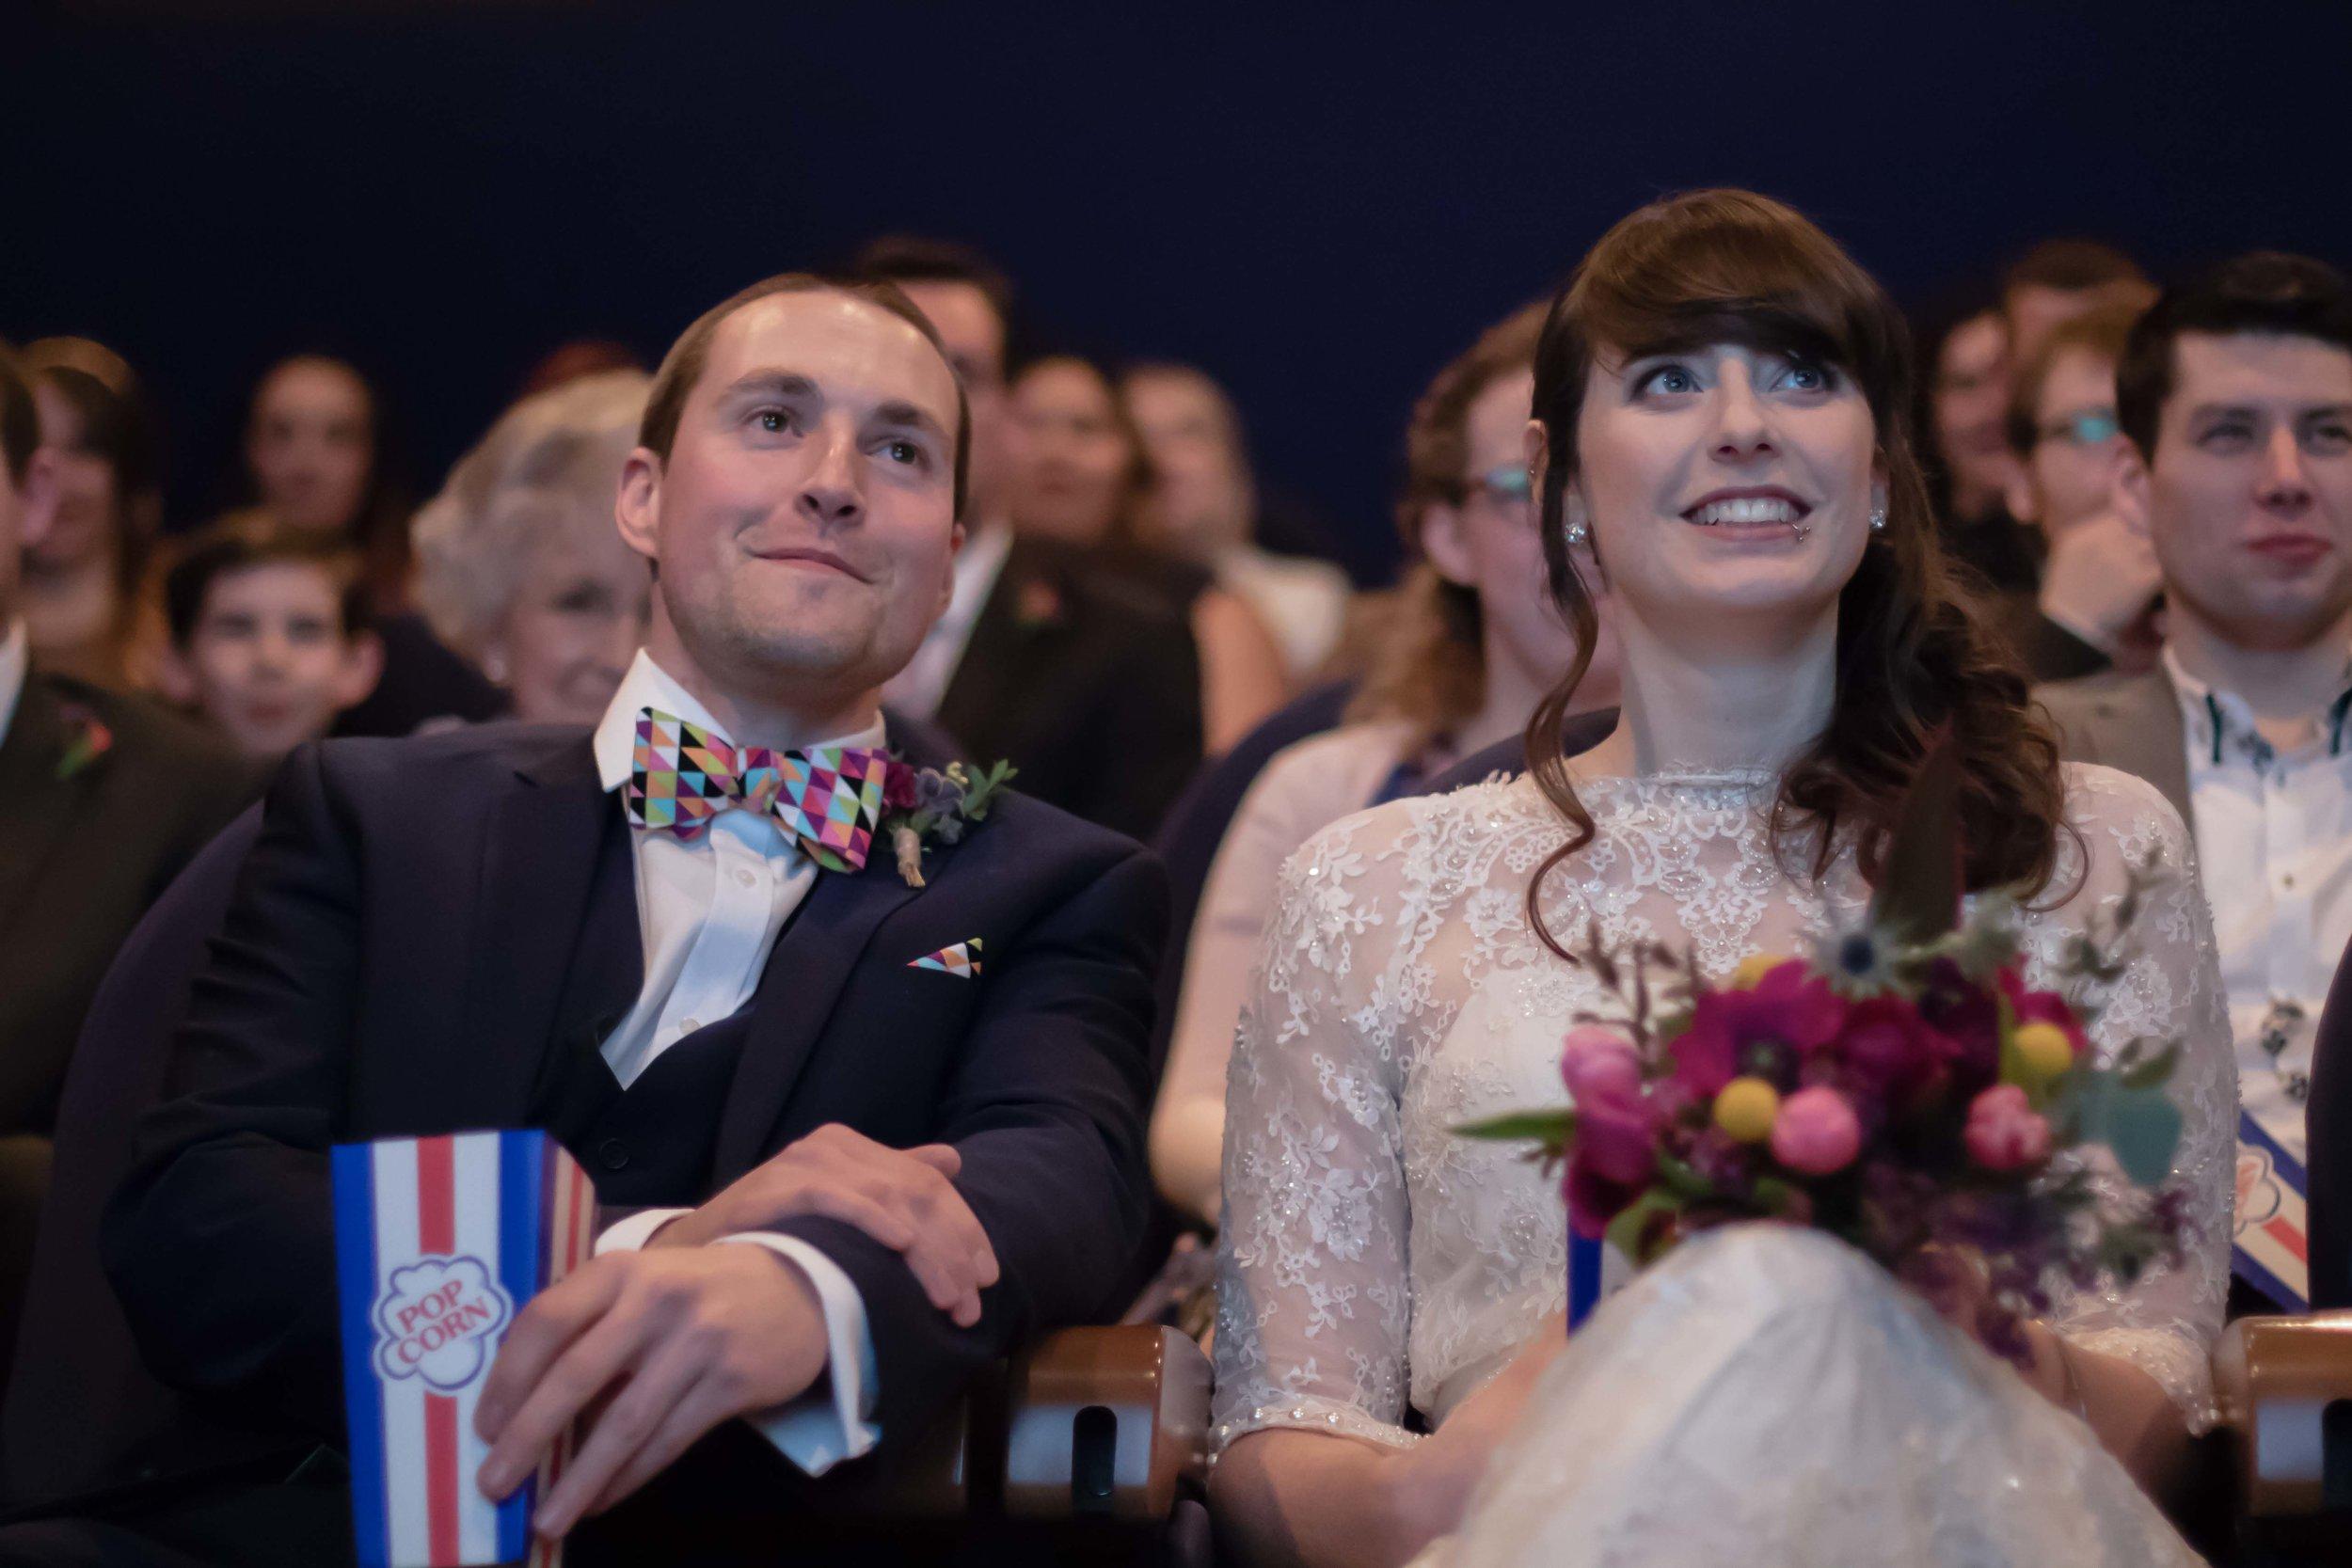 Adam & Faye - Wright Wedding Photography - Bristol Wedding Photographer -89.jpg